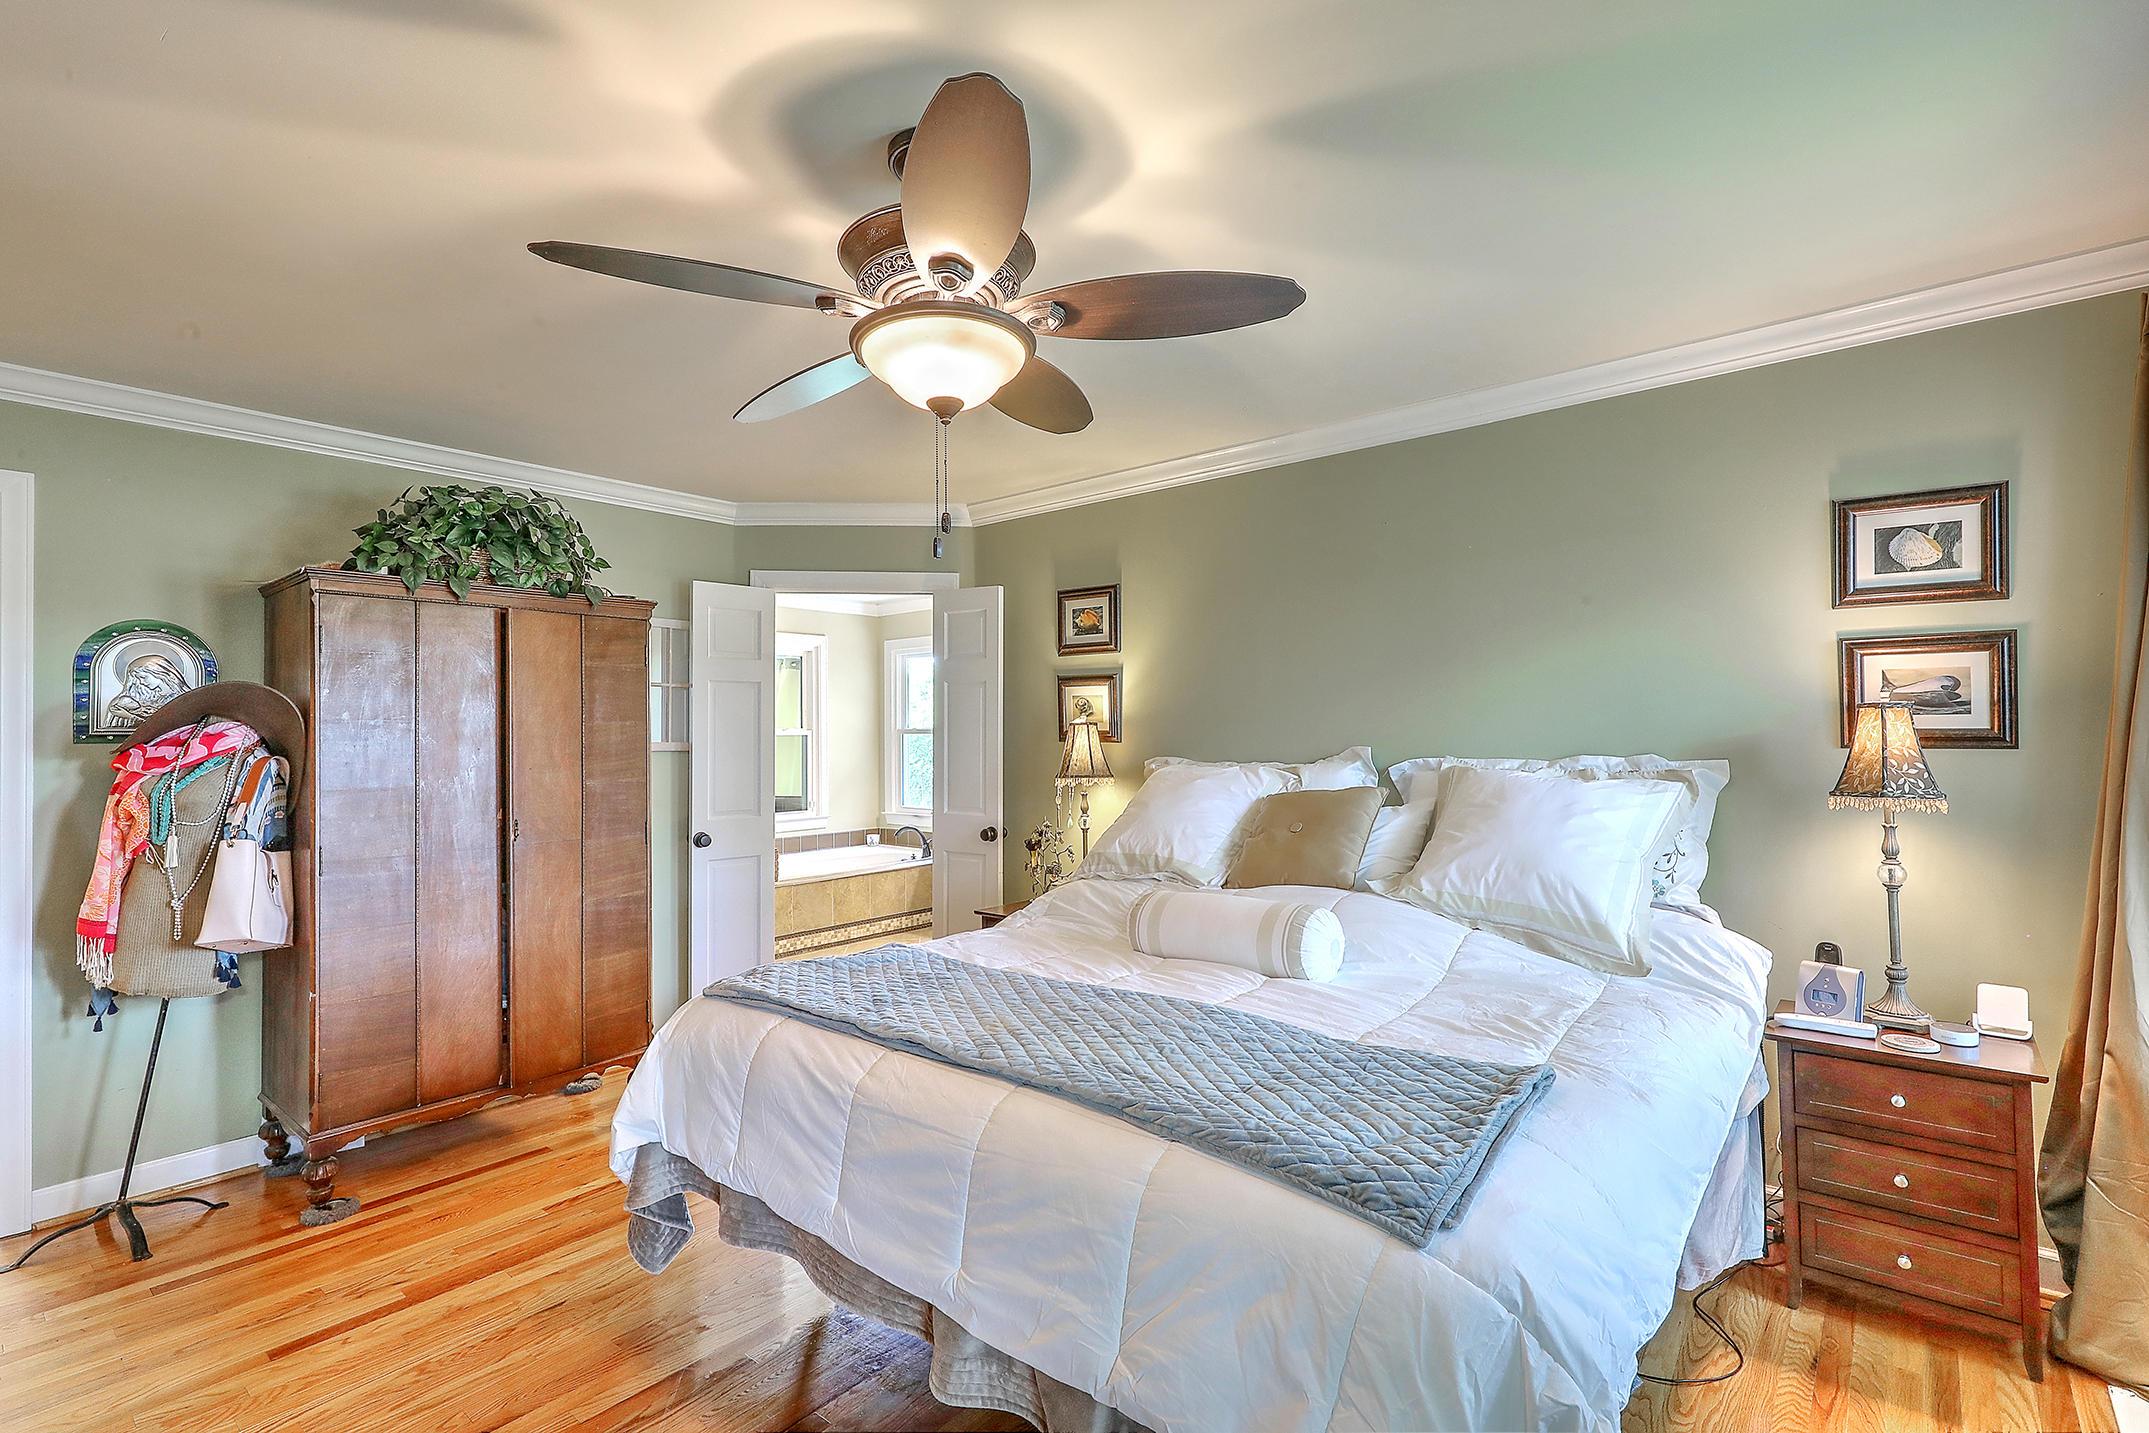 Stono Pointe Homes For Sale - 2660 Burden Creek, Johns Island, SC - 35